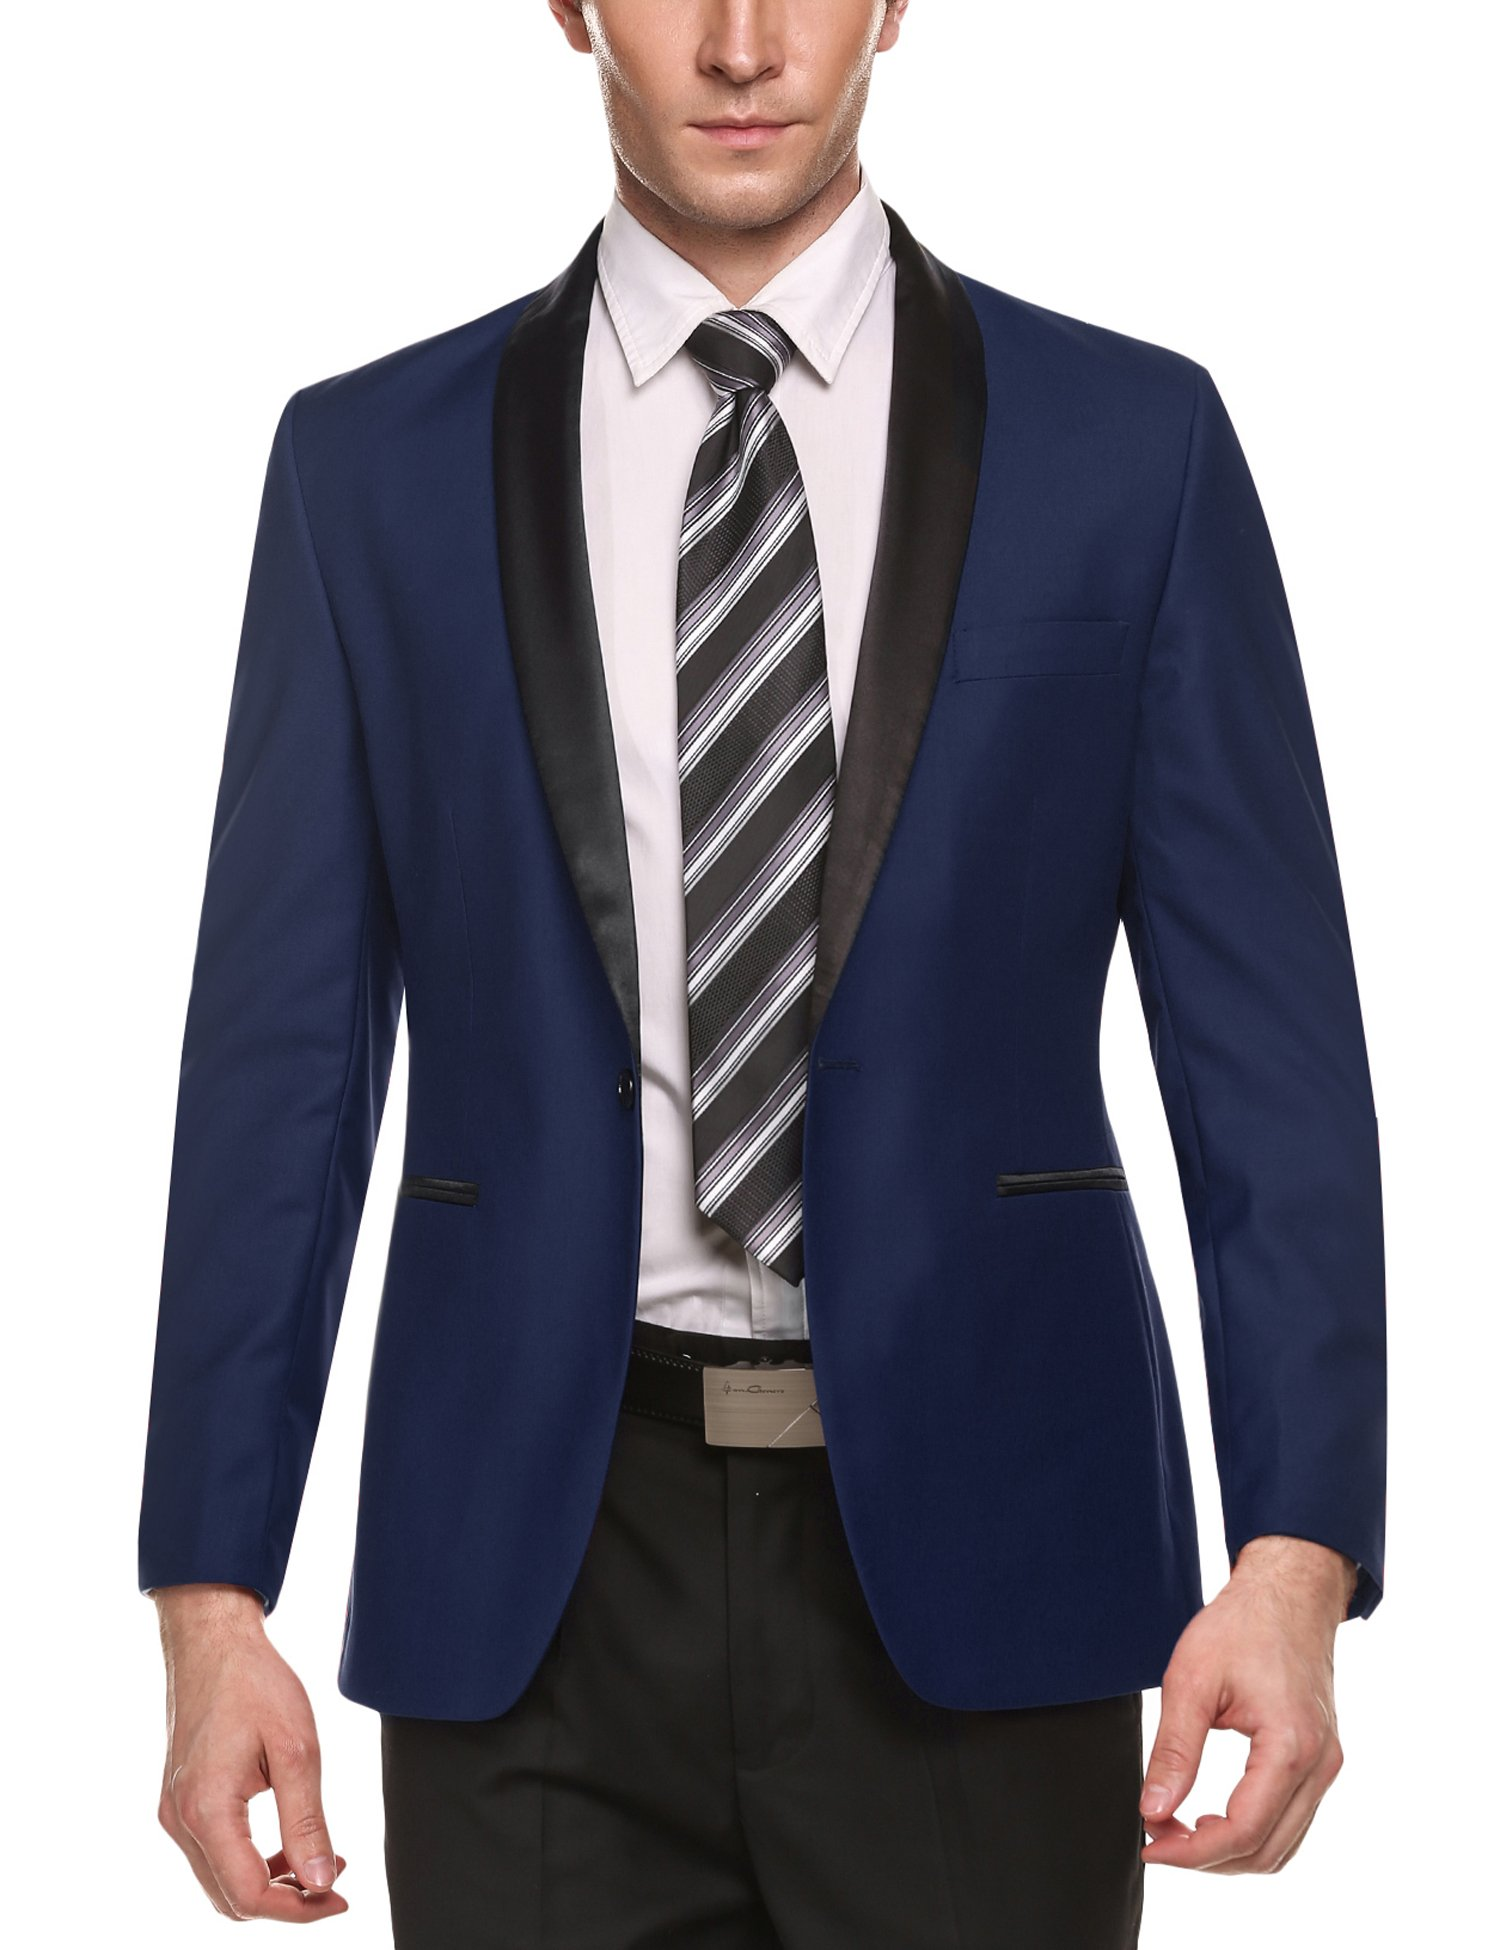 COOFANDY Men's Slim Fit Blazer Jacket Casual One Button Suit Coat